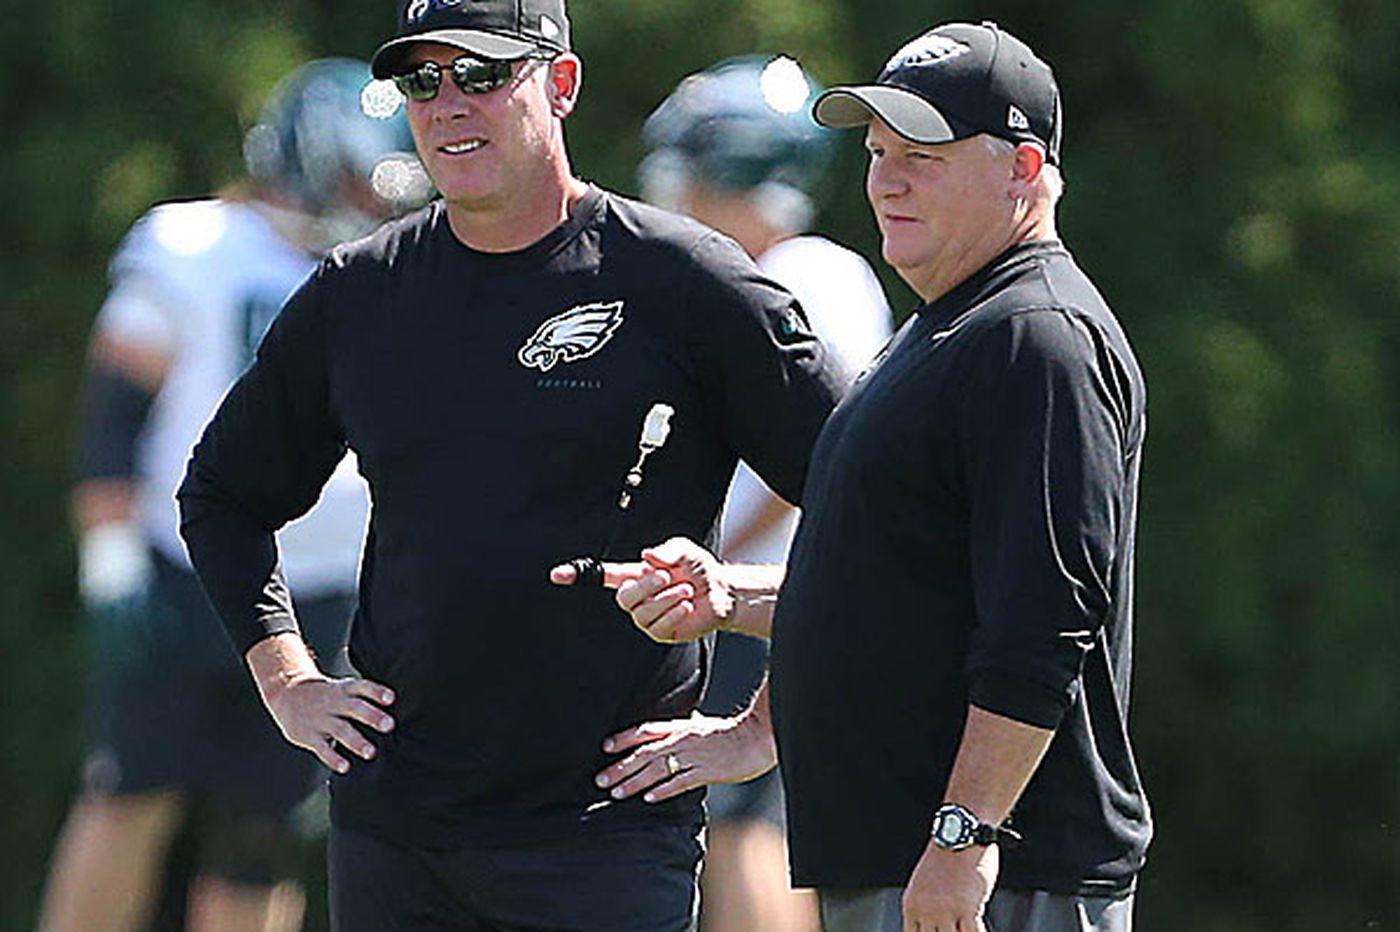 Raiders will interview Pat Shurmur, source says